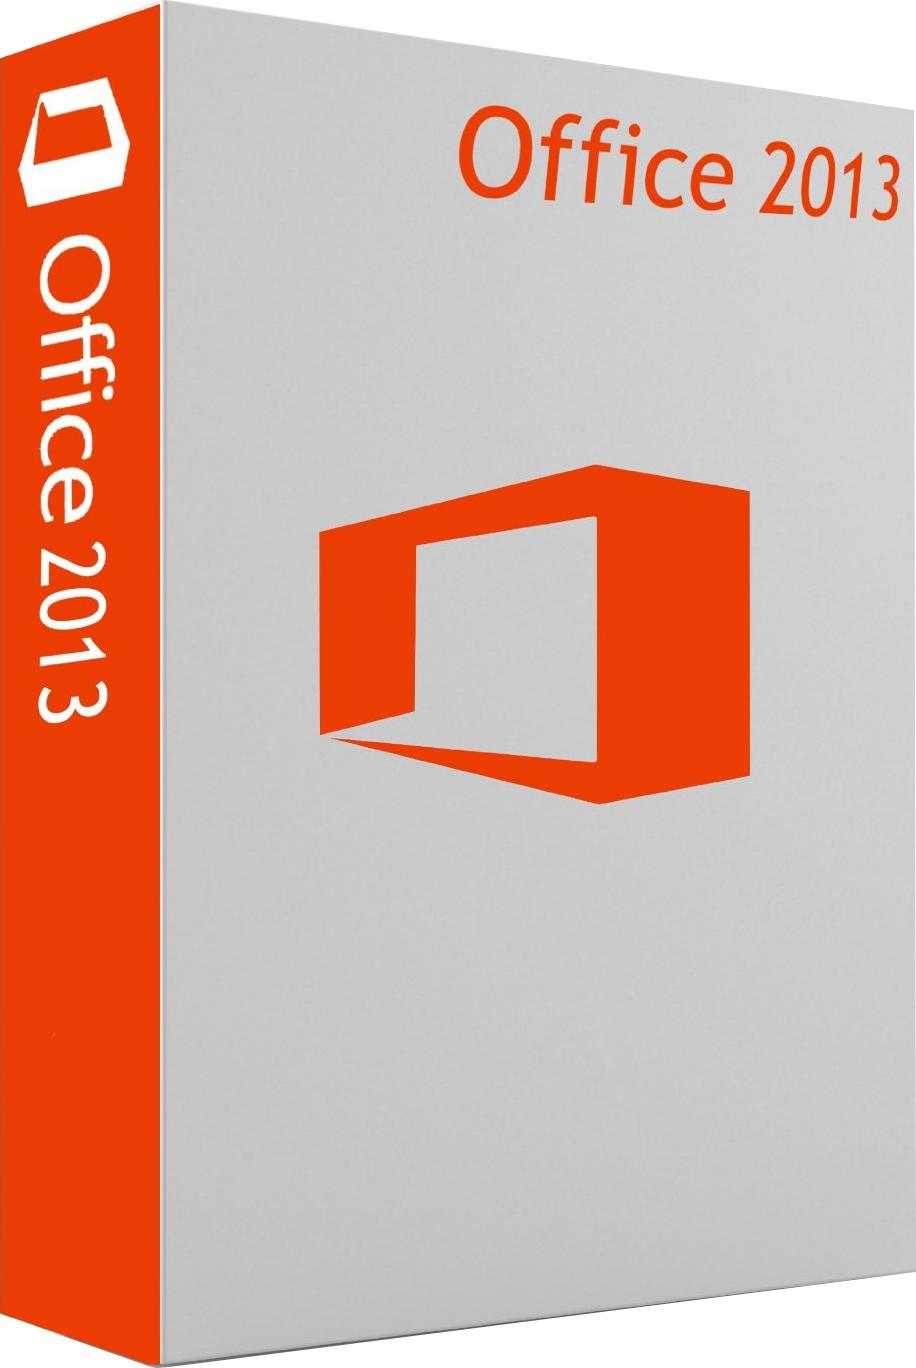 download microsoft office 2013 full version